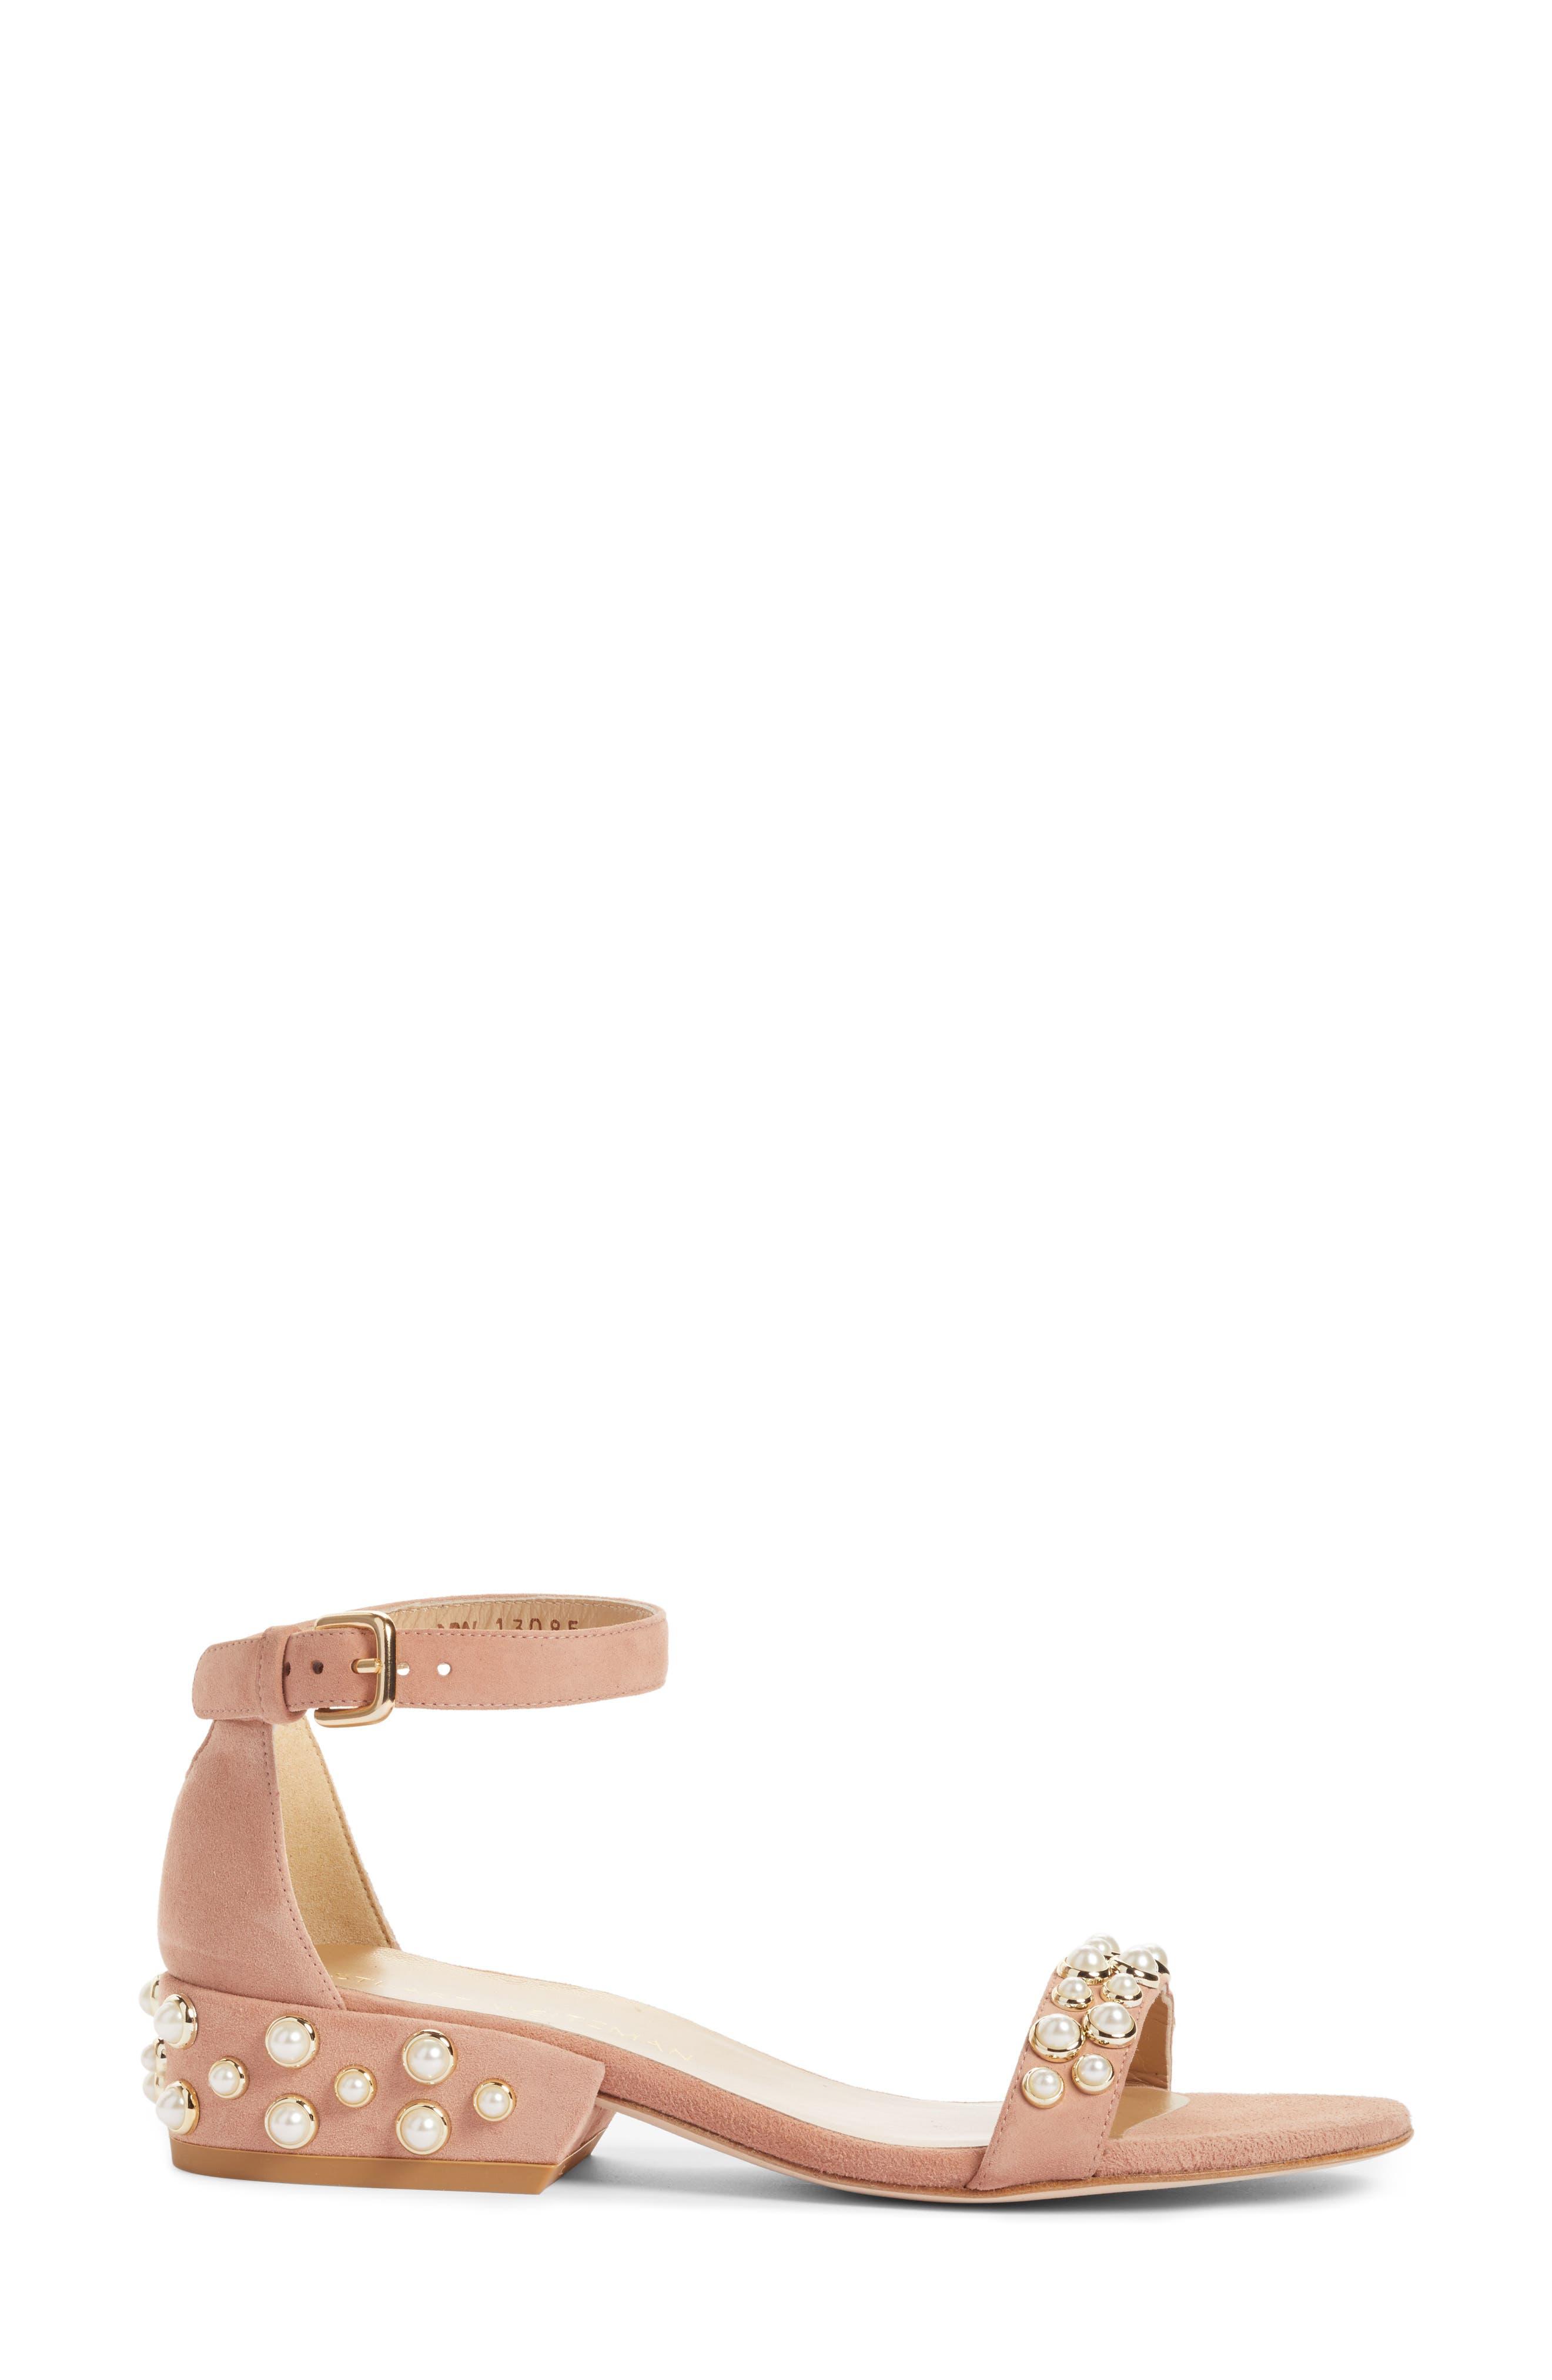 Allpearls Ankle Strap Sandal,                             Alternate thumbnail 3, color,                             200